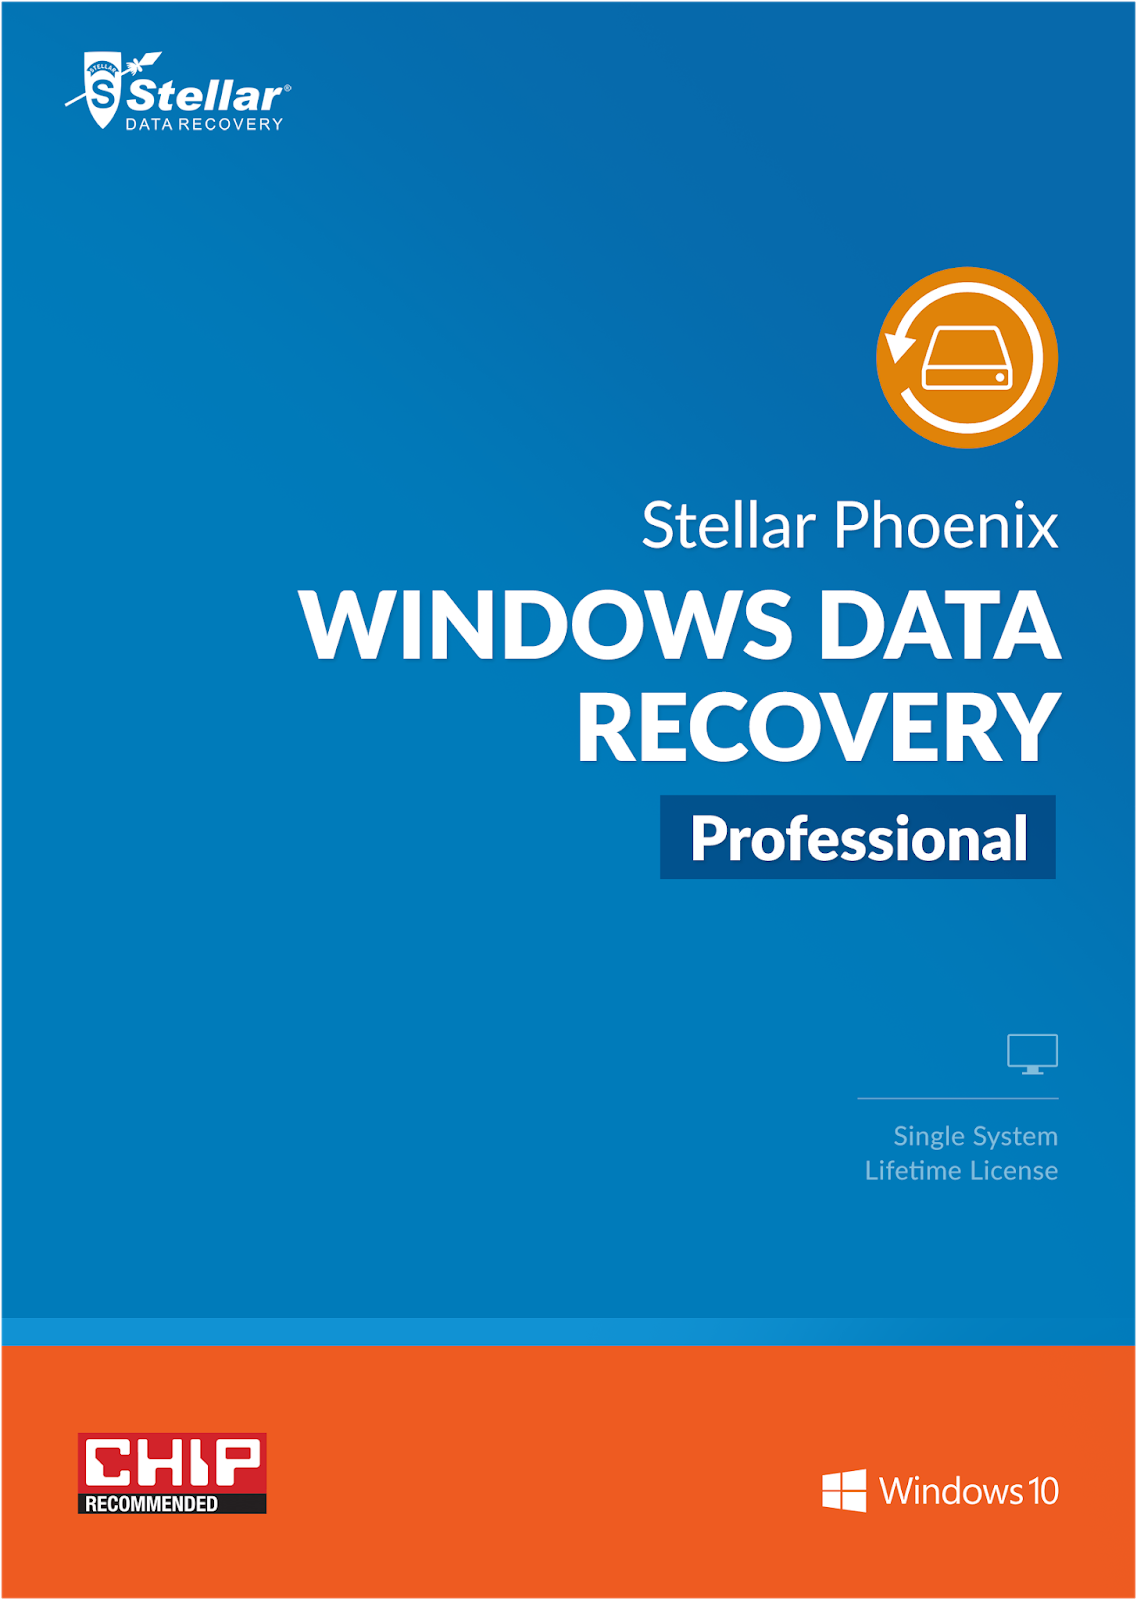 stellar phoenix mac data recovery 7.1 registration key crack